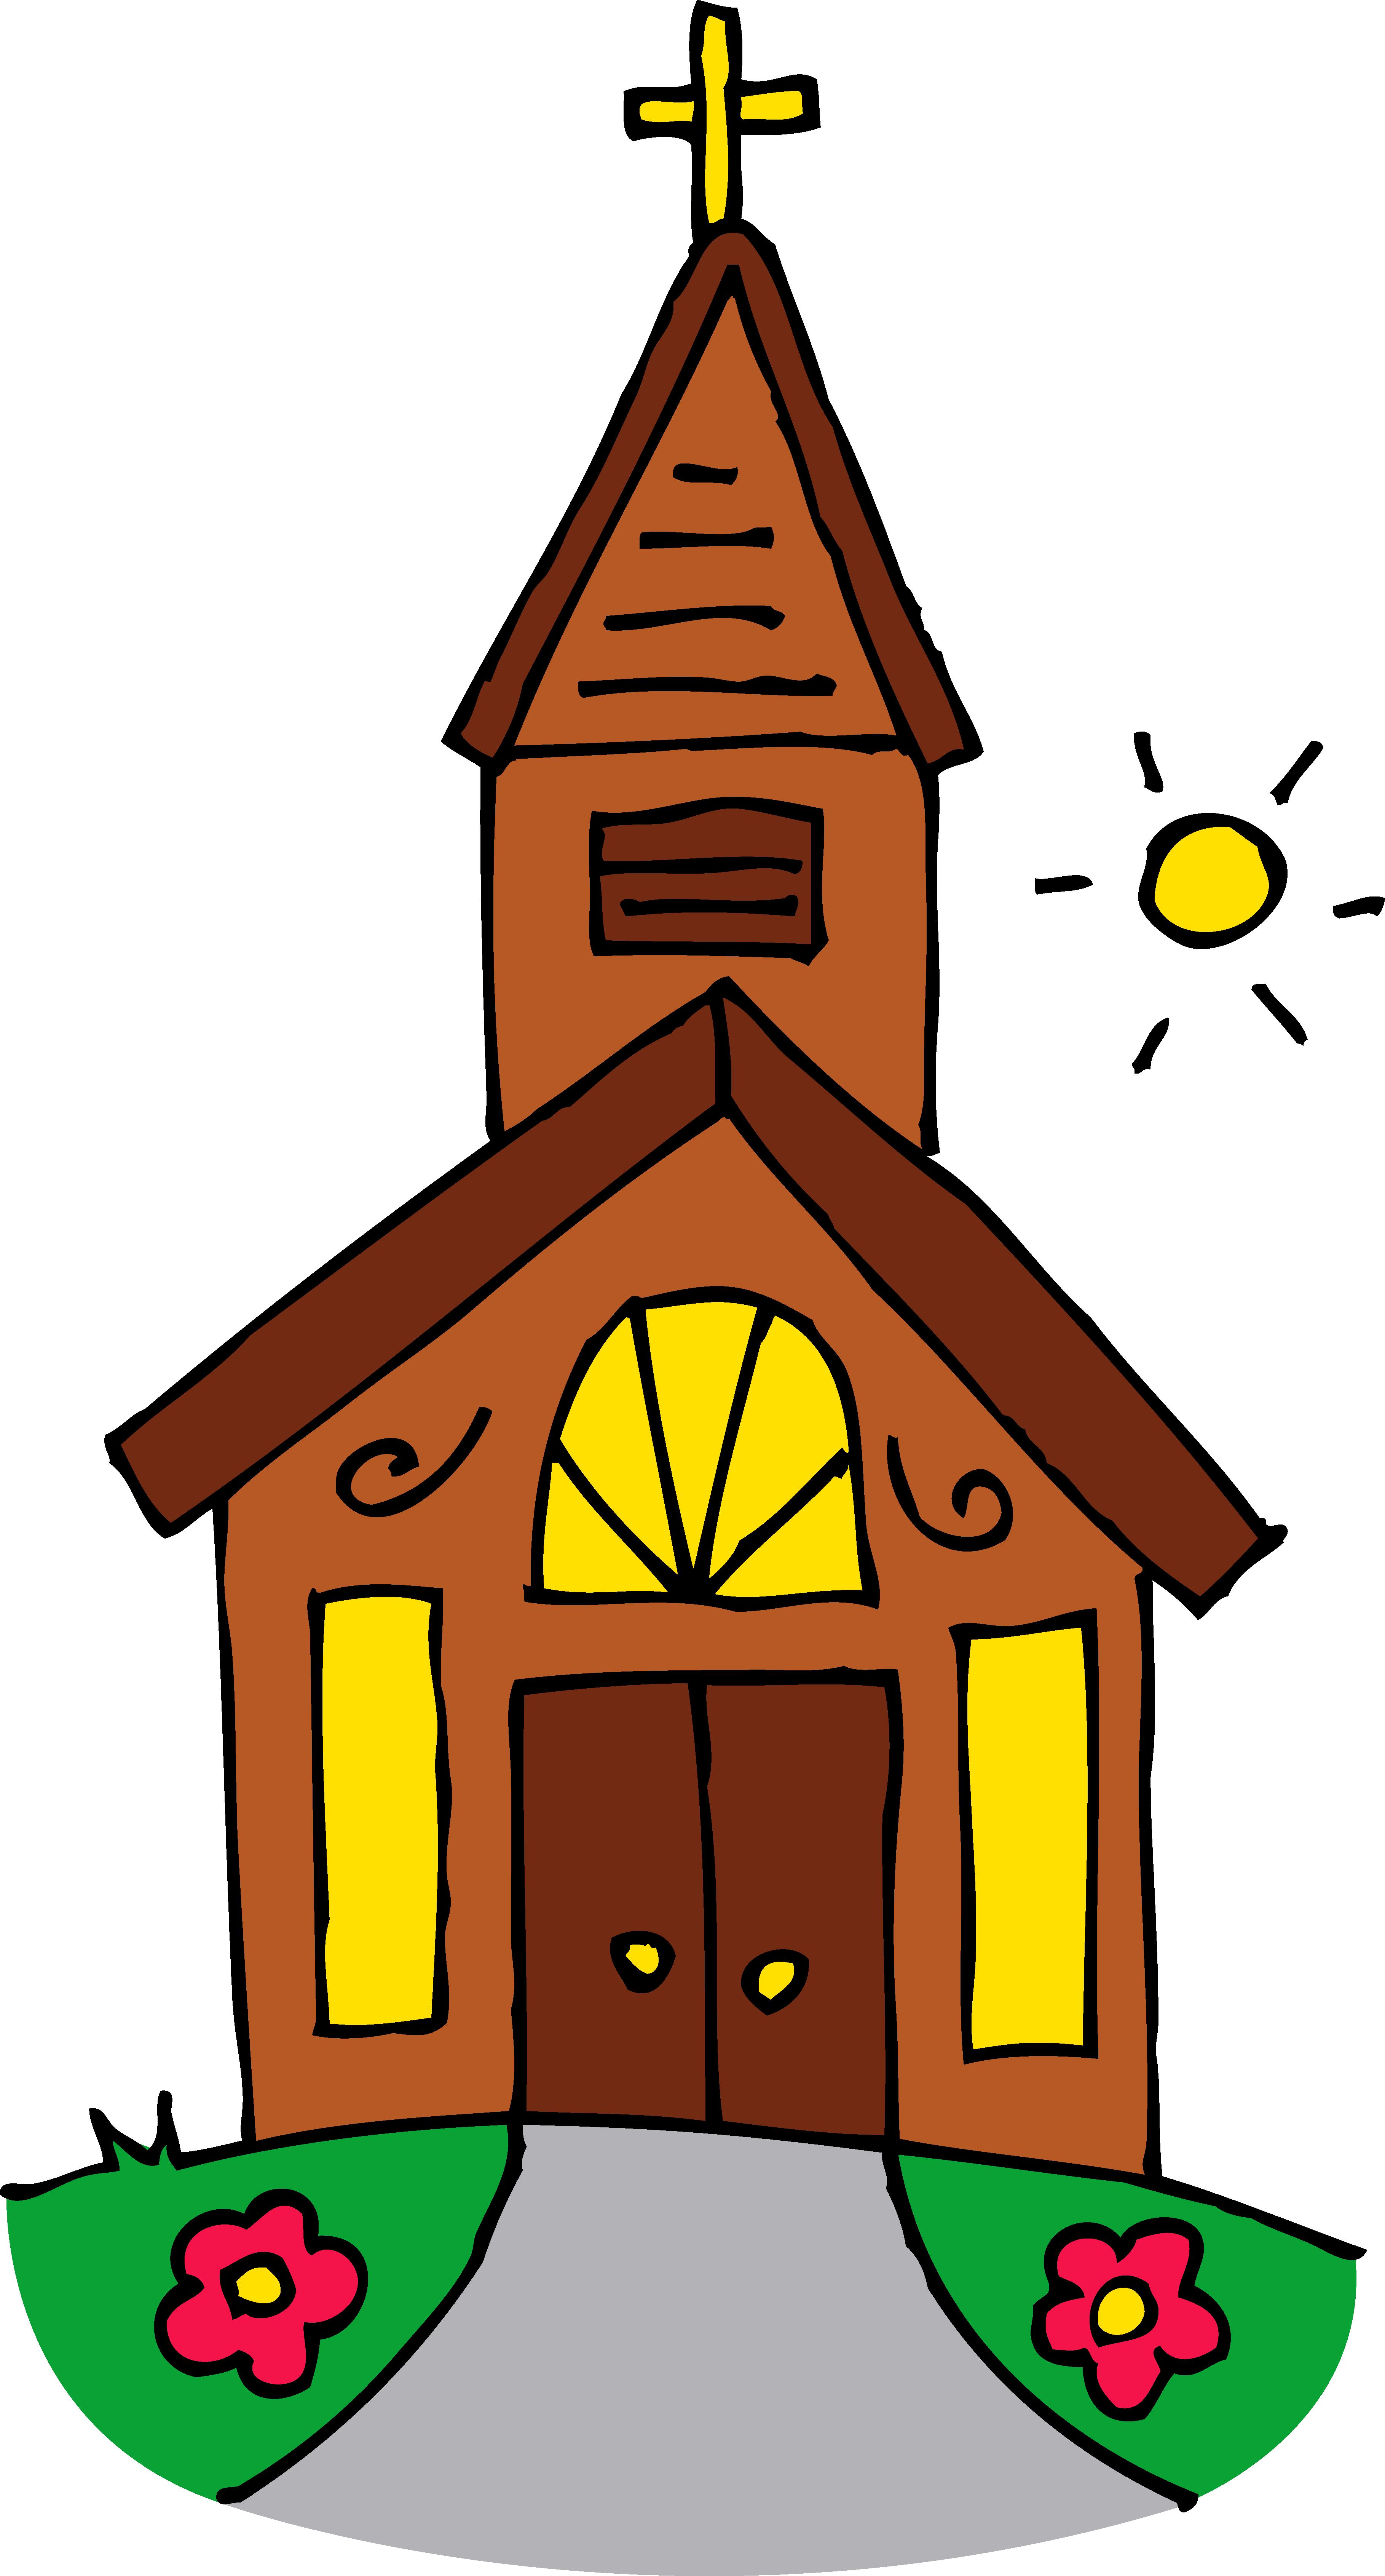 Church Clip Art - Blogsbeta-Church Clip Art - Blogsbeta-5